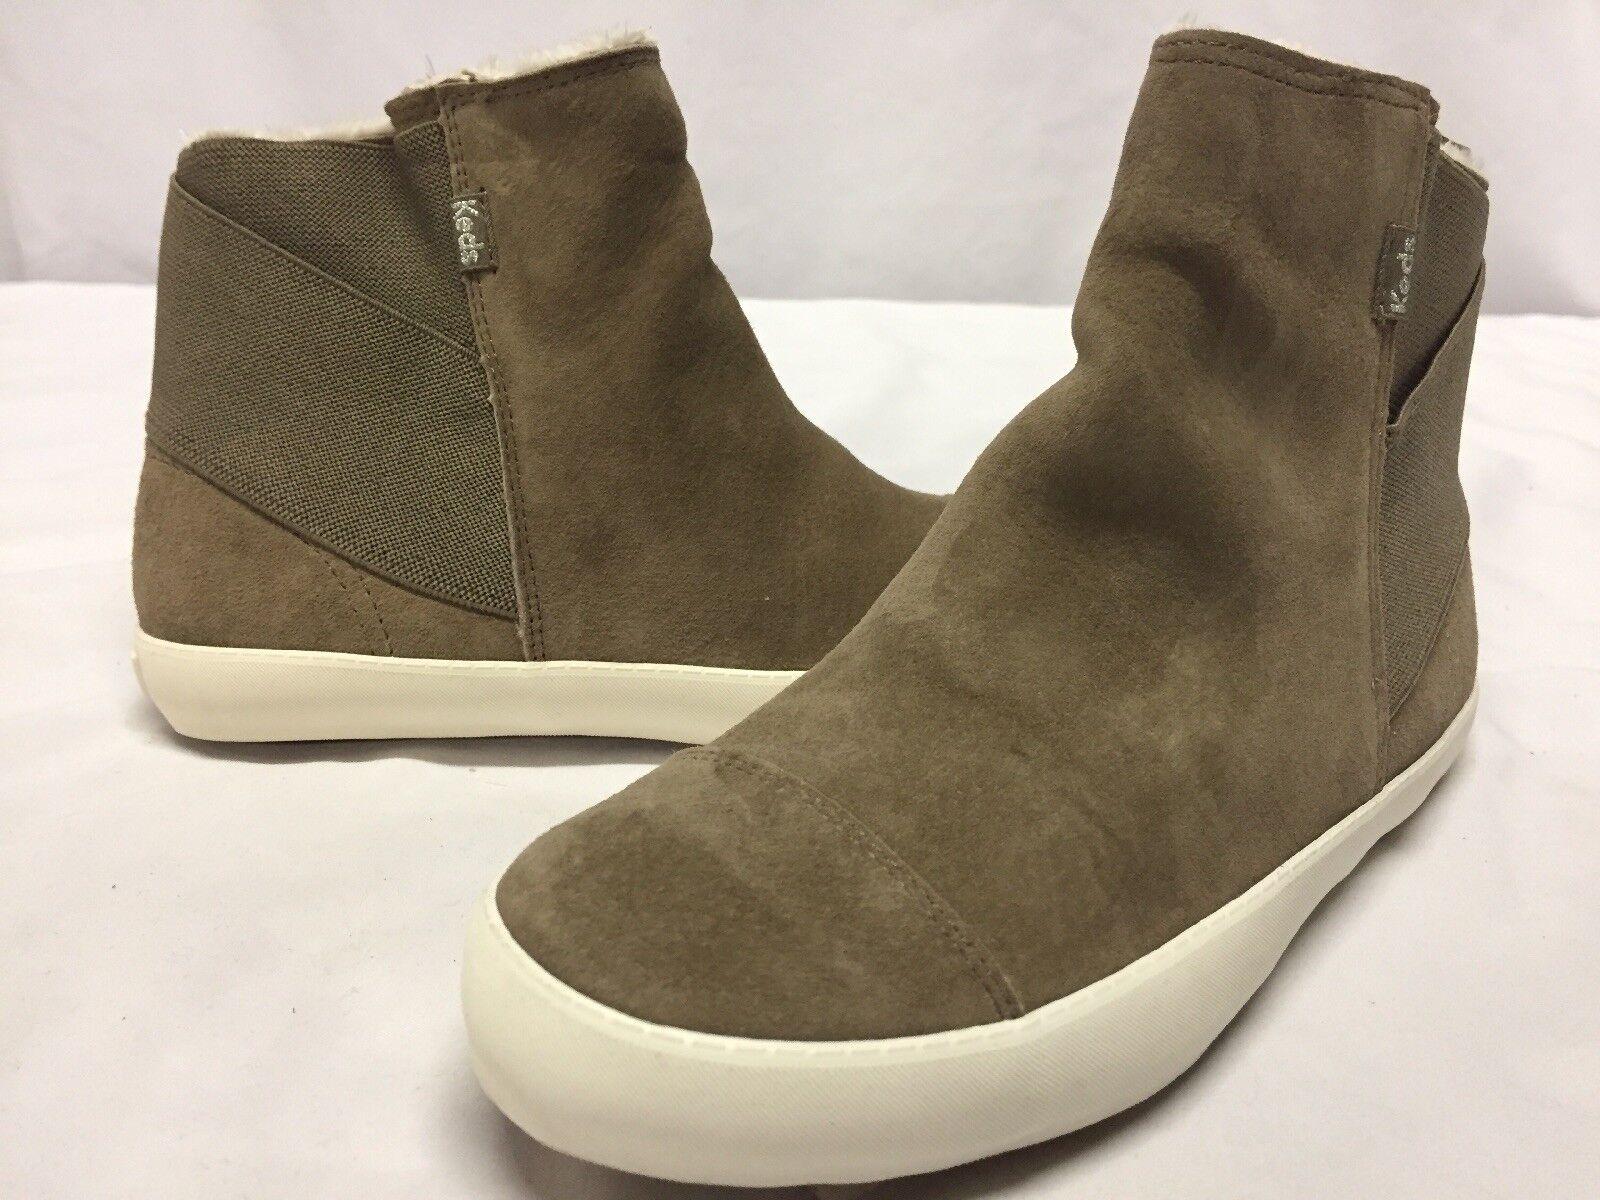 Para mujer botas Invierno Nieve Keds Crosstown, Crosstown, Crosstown, Fossil Gamuza, Talla 6 EUR 36 UK 3.5  online al mejor precio